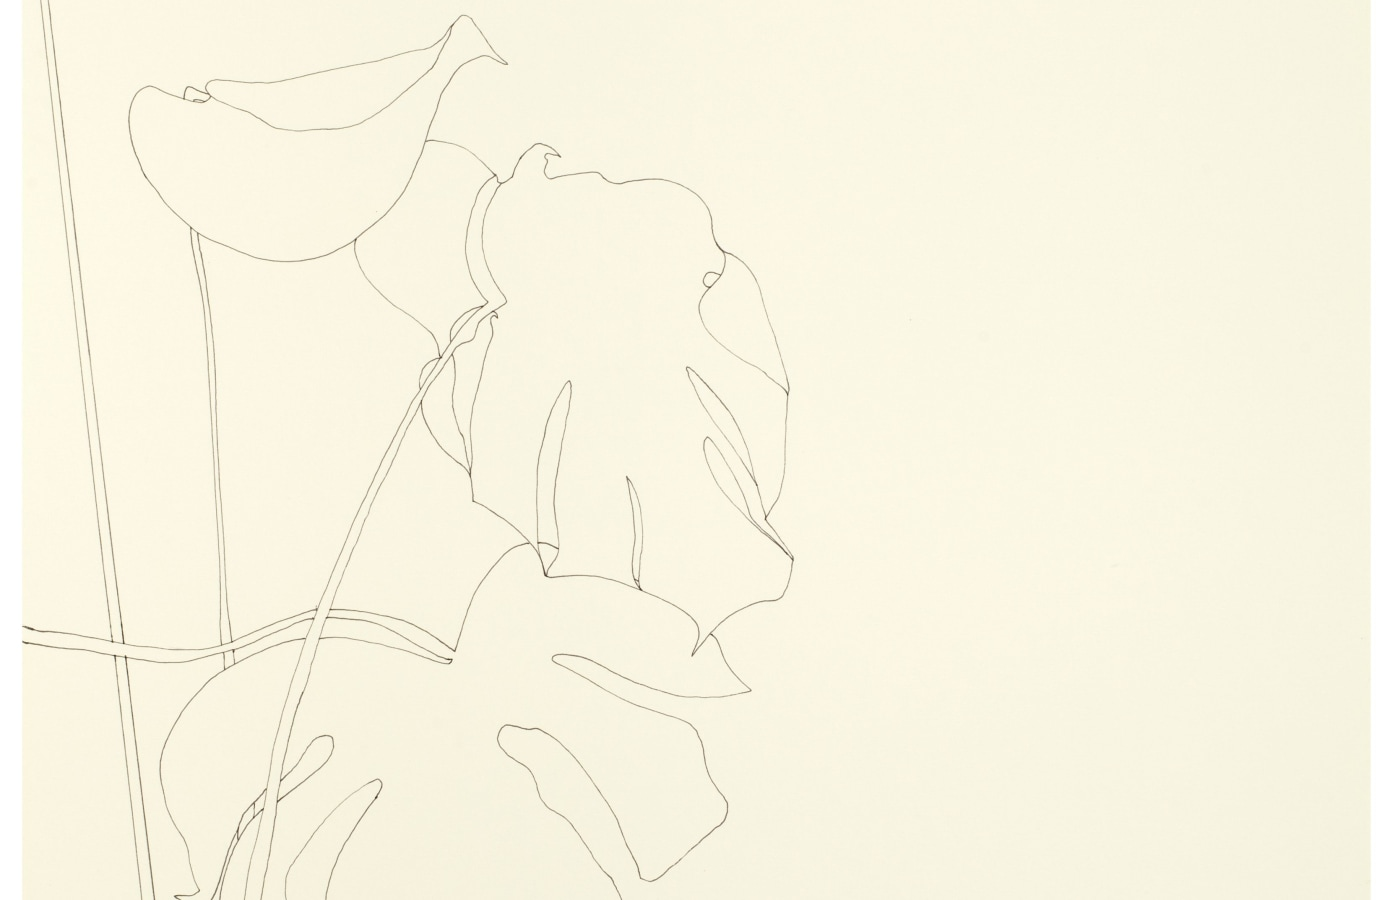 Art on Paper, Amsterdam | 2019, Ronald de Bloeme, Rakuko Naito, Ronald Zuurmond,